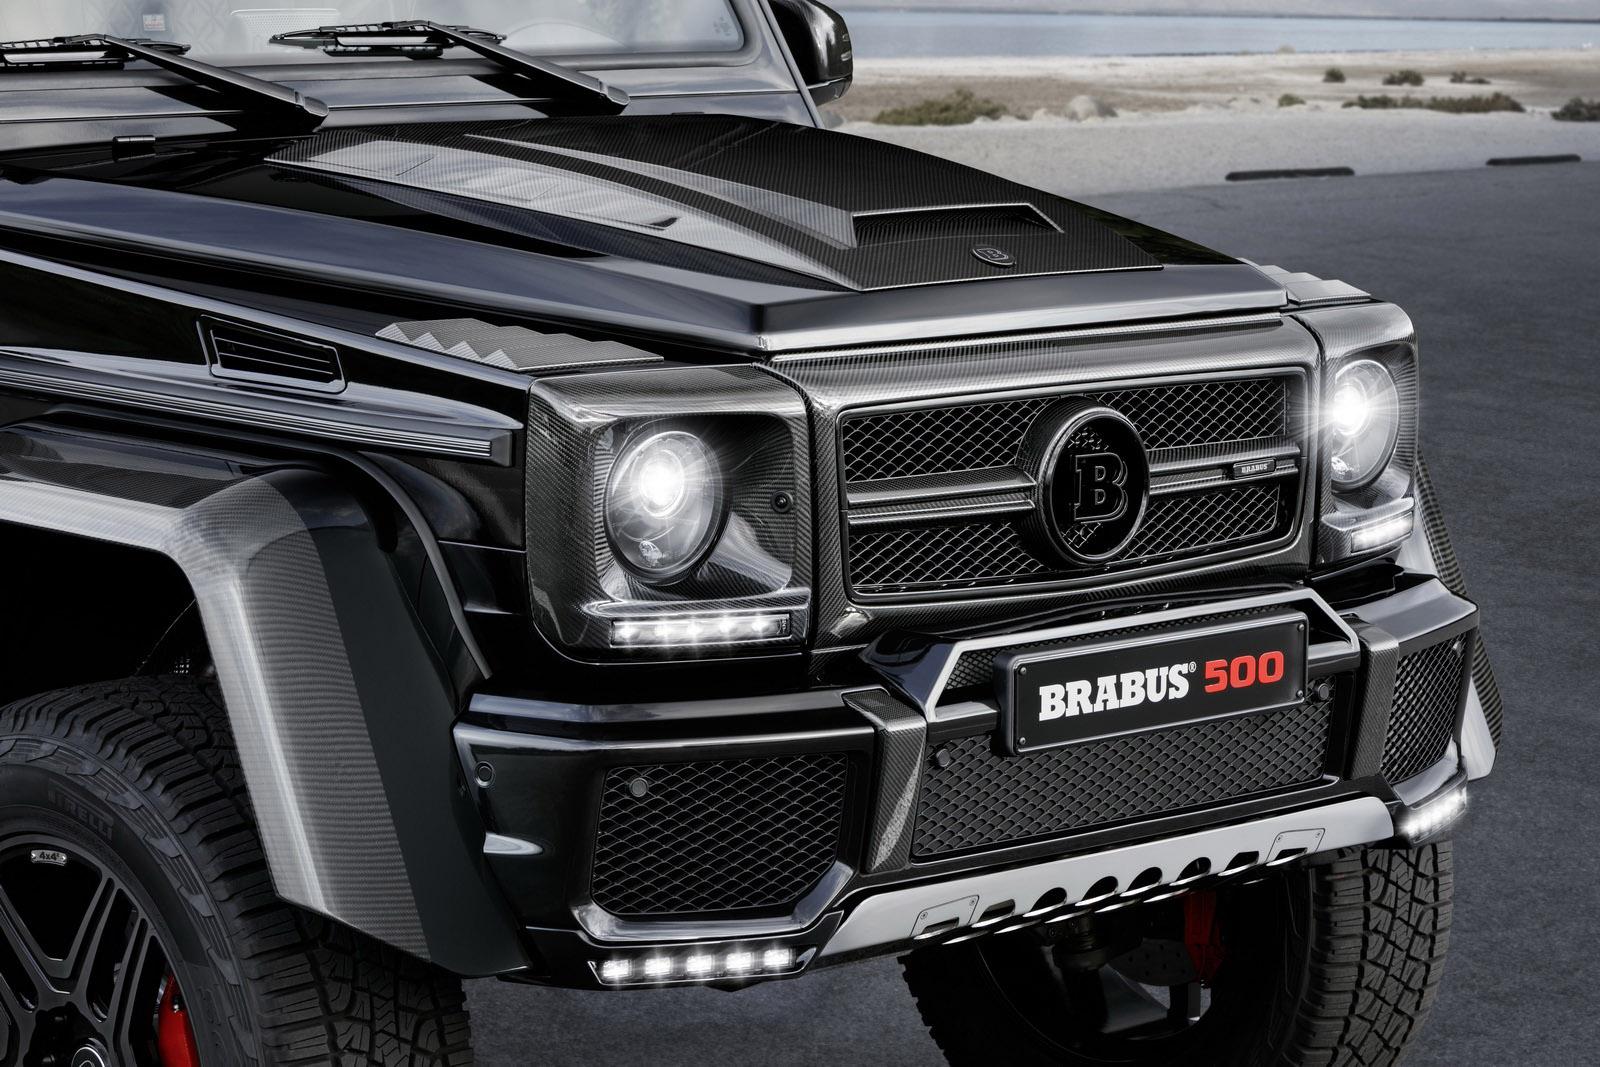 brabus announces mercedes benz g 500 4x4 project for frankfurt. Black Bedroom Furniture Sets. Home Design Ideas